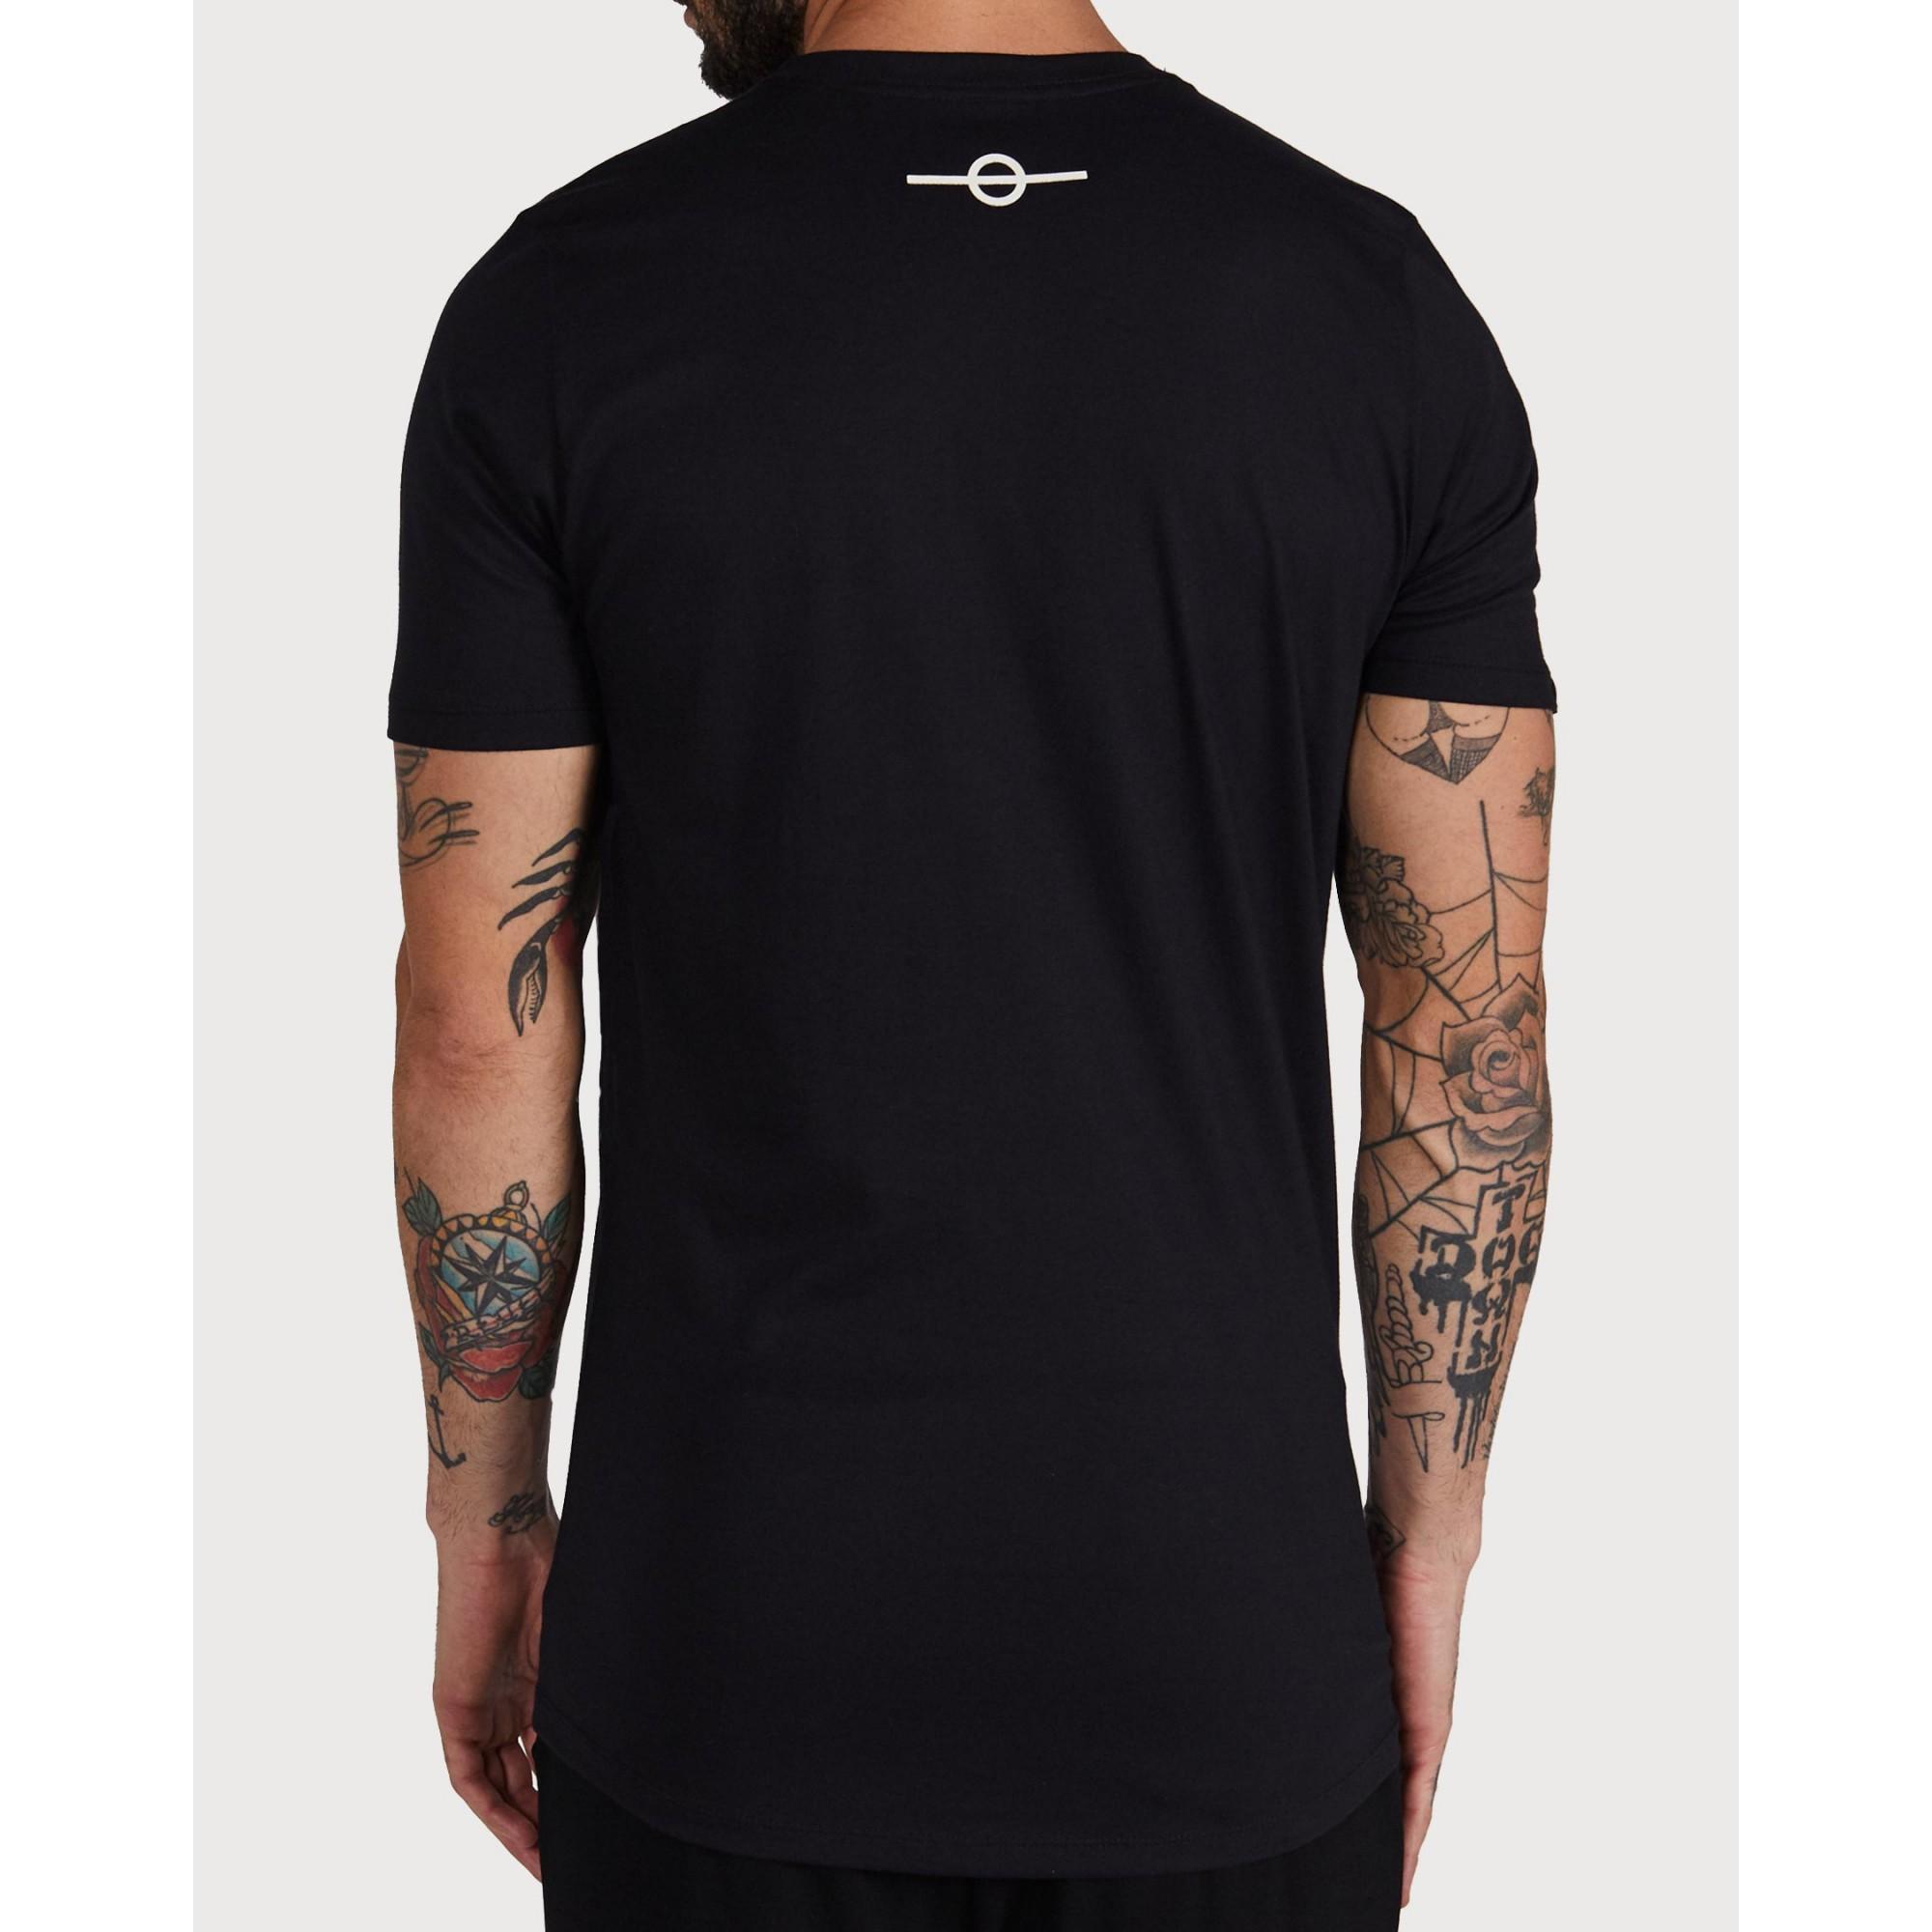 Camiseta Buh Fire Relevo Black